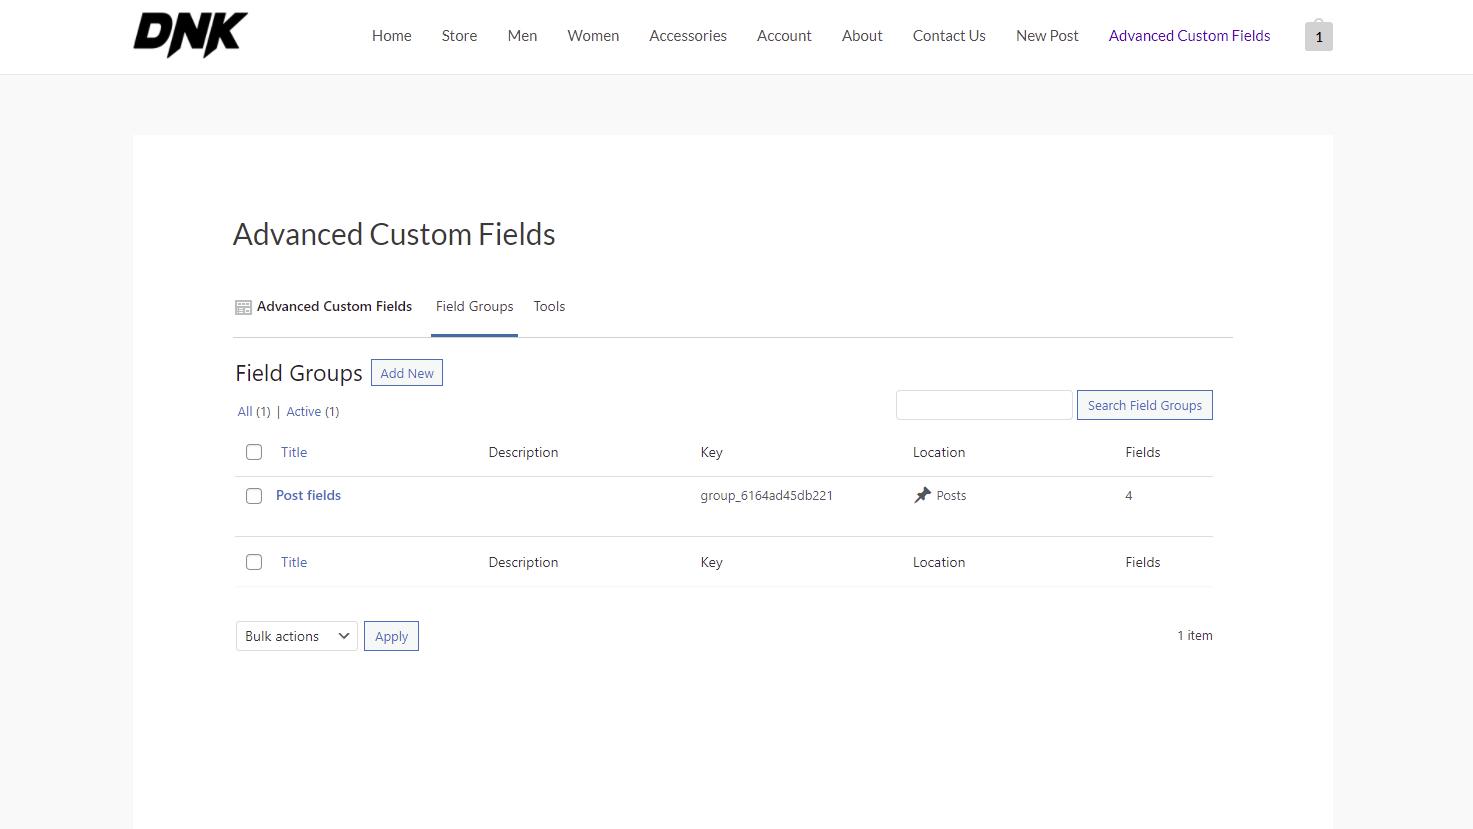 advanced custom fields on the frontend